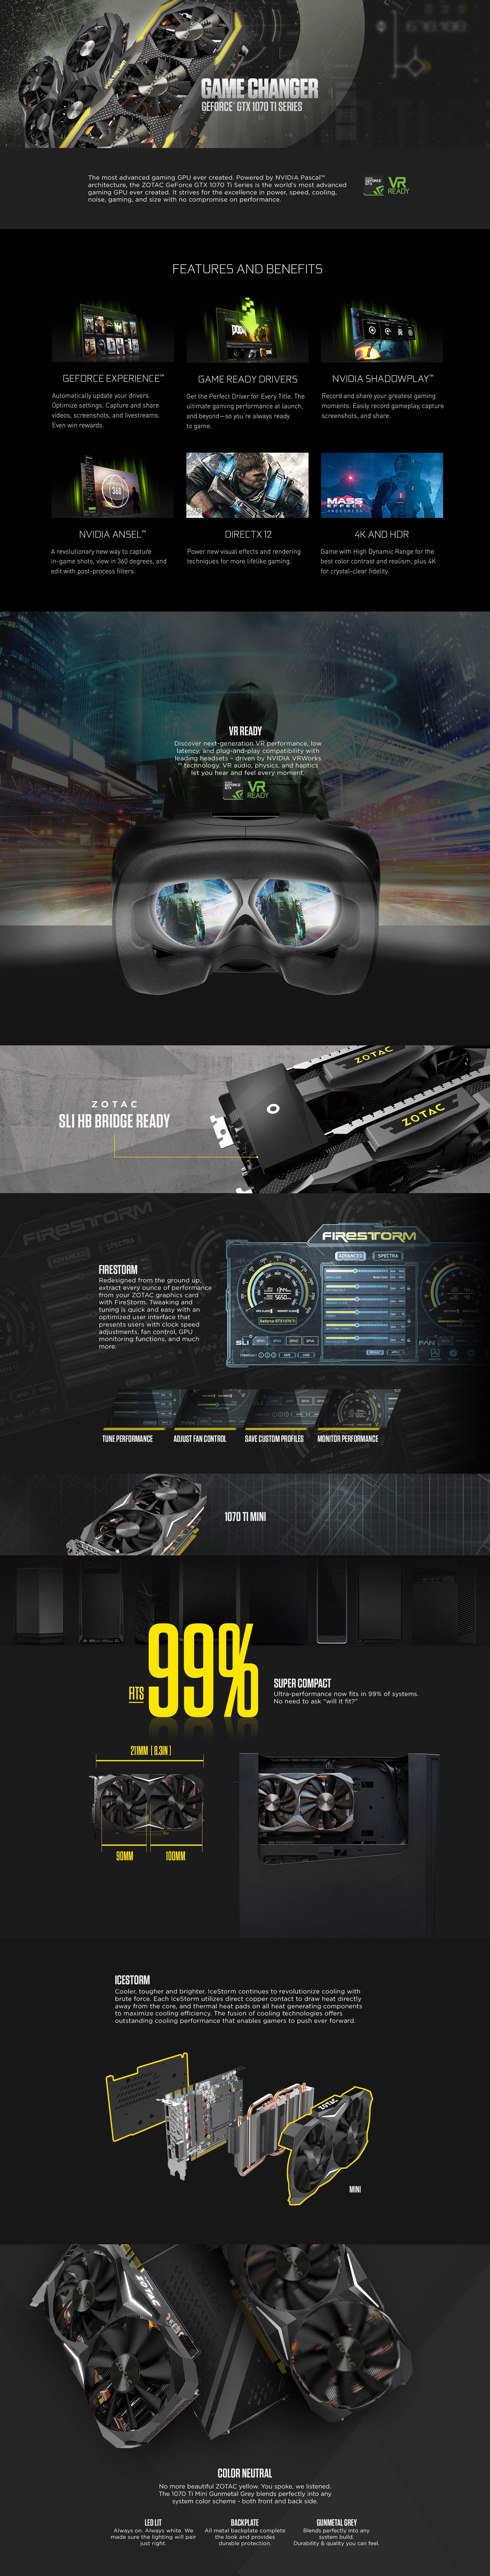 ZOTAC GeForce® GTX 1070 Ti Mini | ZOTAC